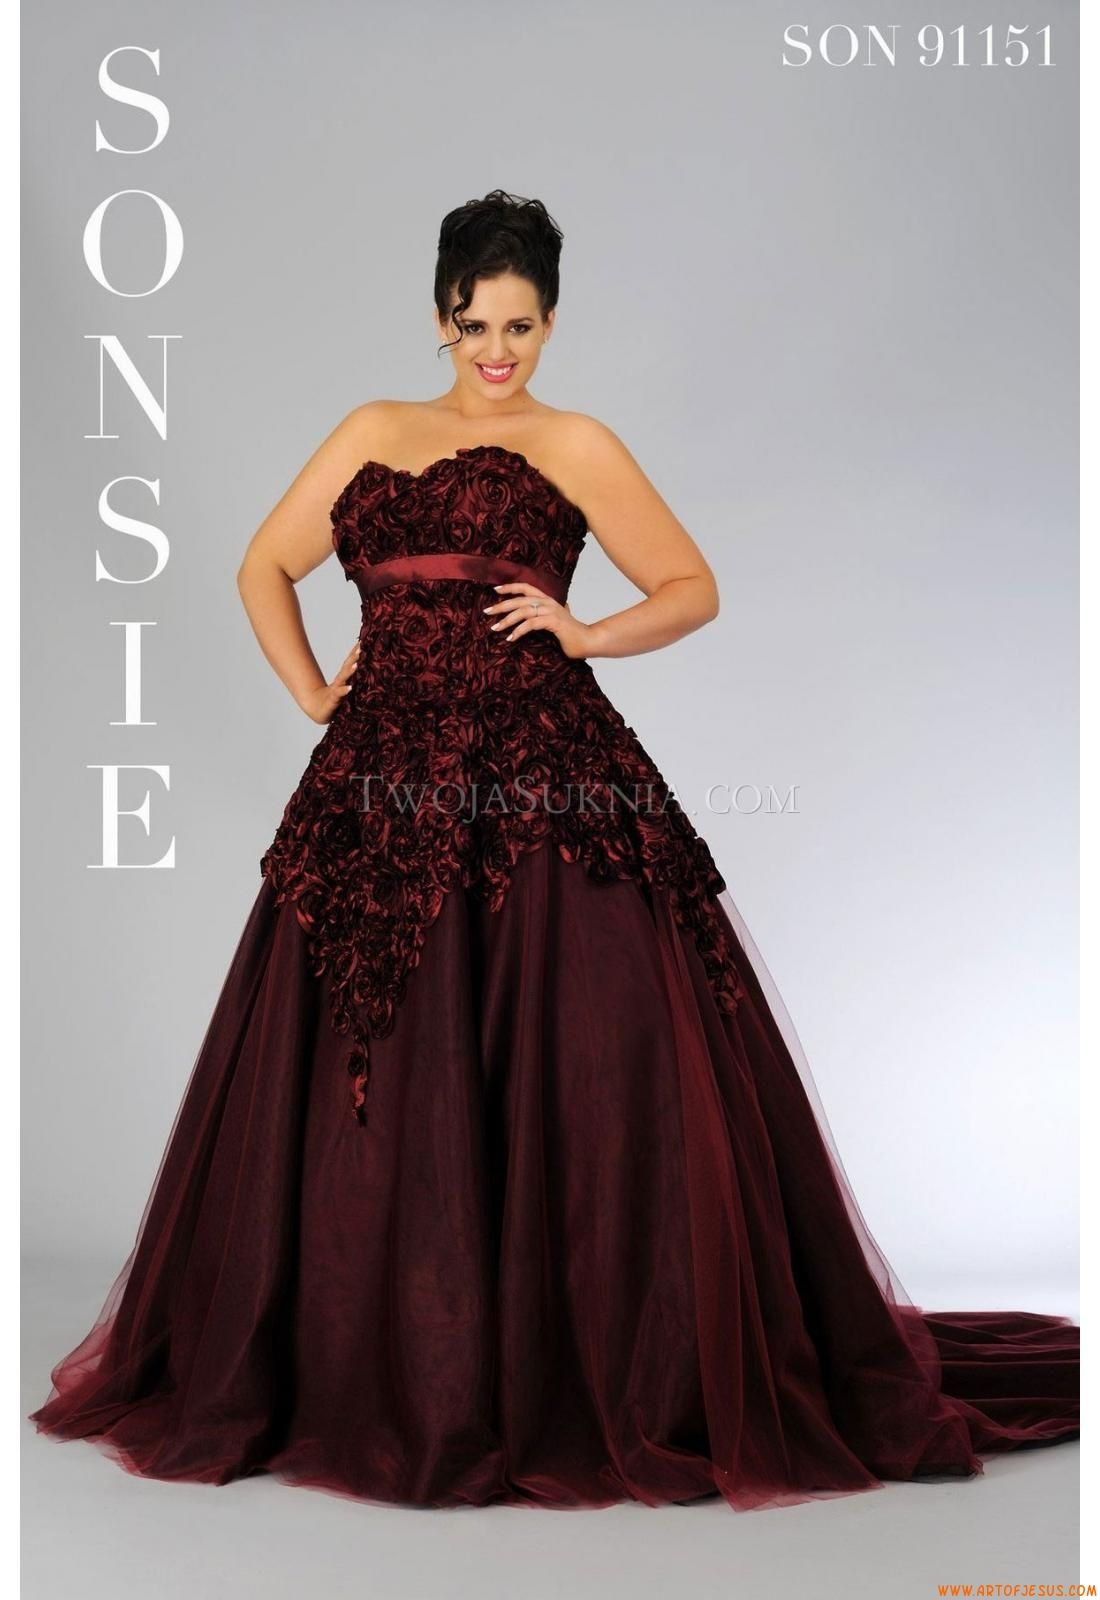 Tea length plus size wedding dresses  Wedding Dresses Veromia SON  Sonsie  plus size wedding dresses